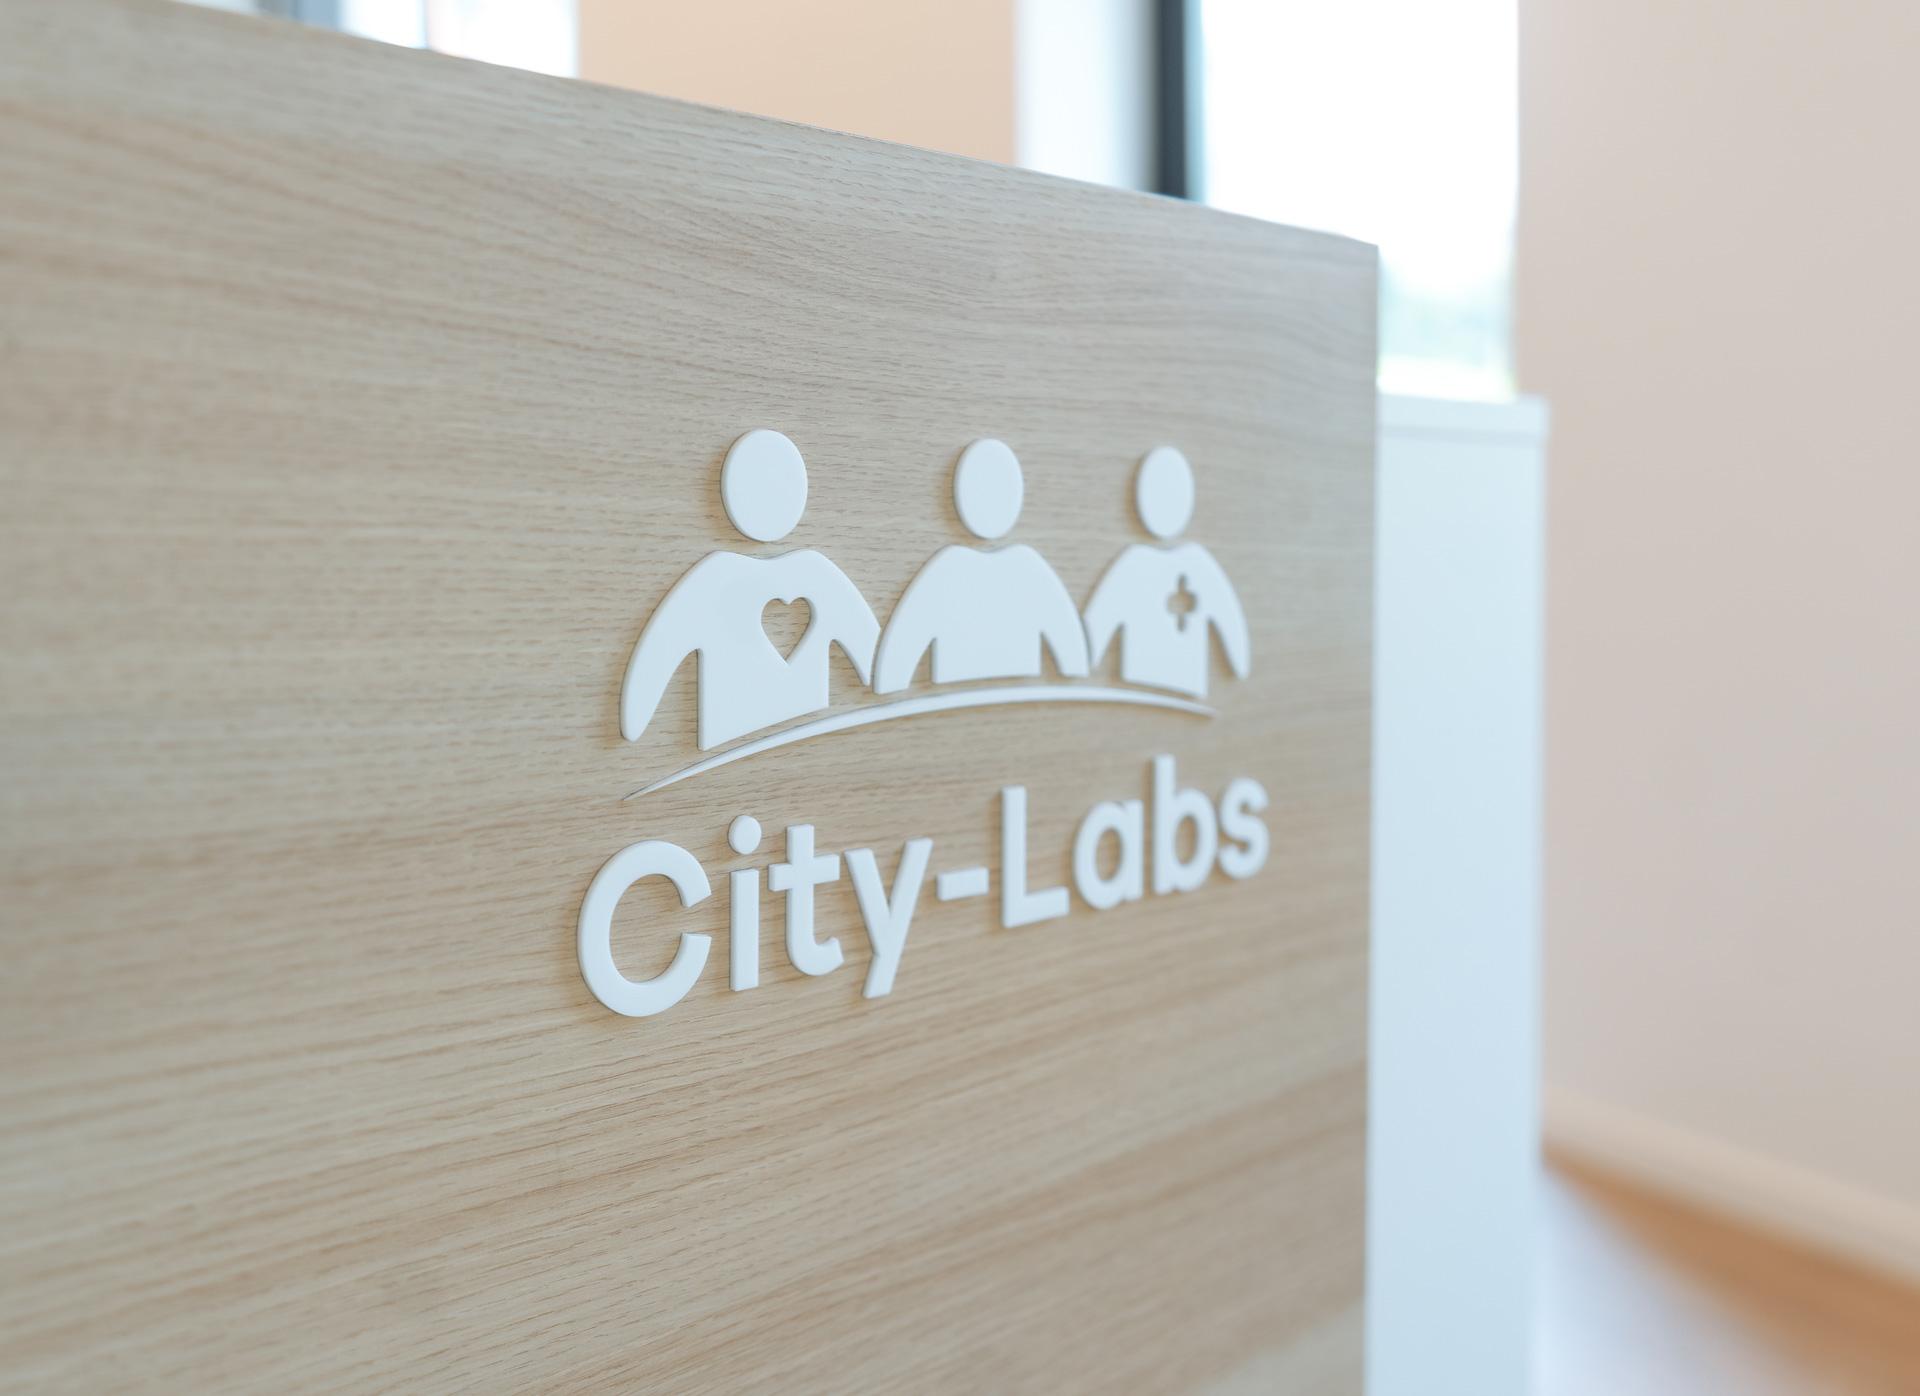 City-Labs